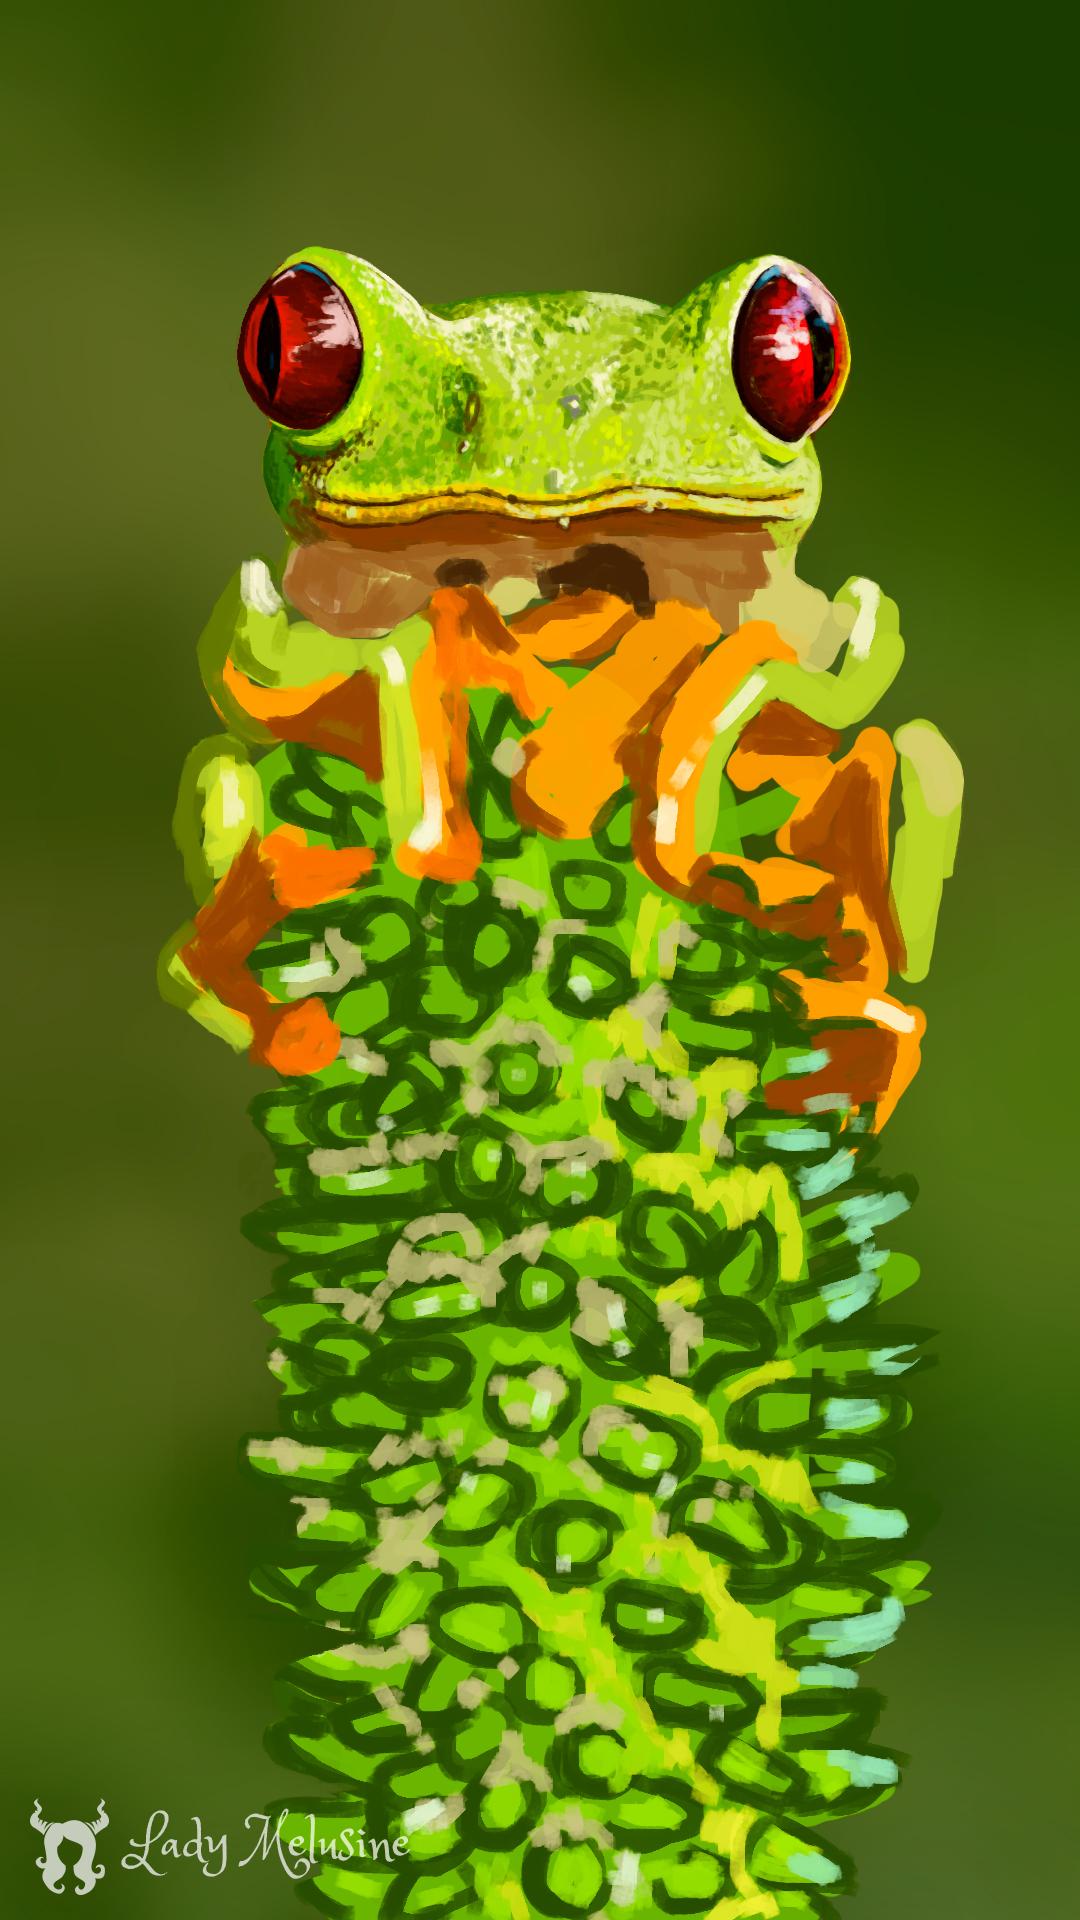 Digital Painting grenouille 06 Lady Melusine